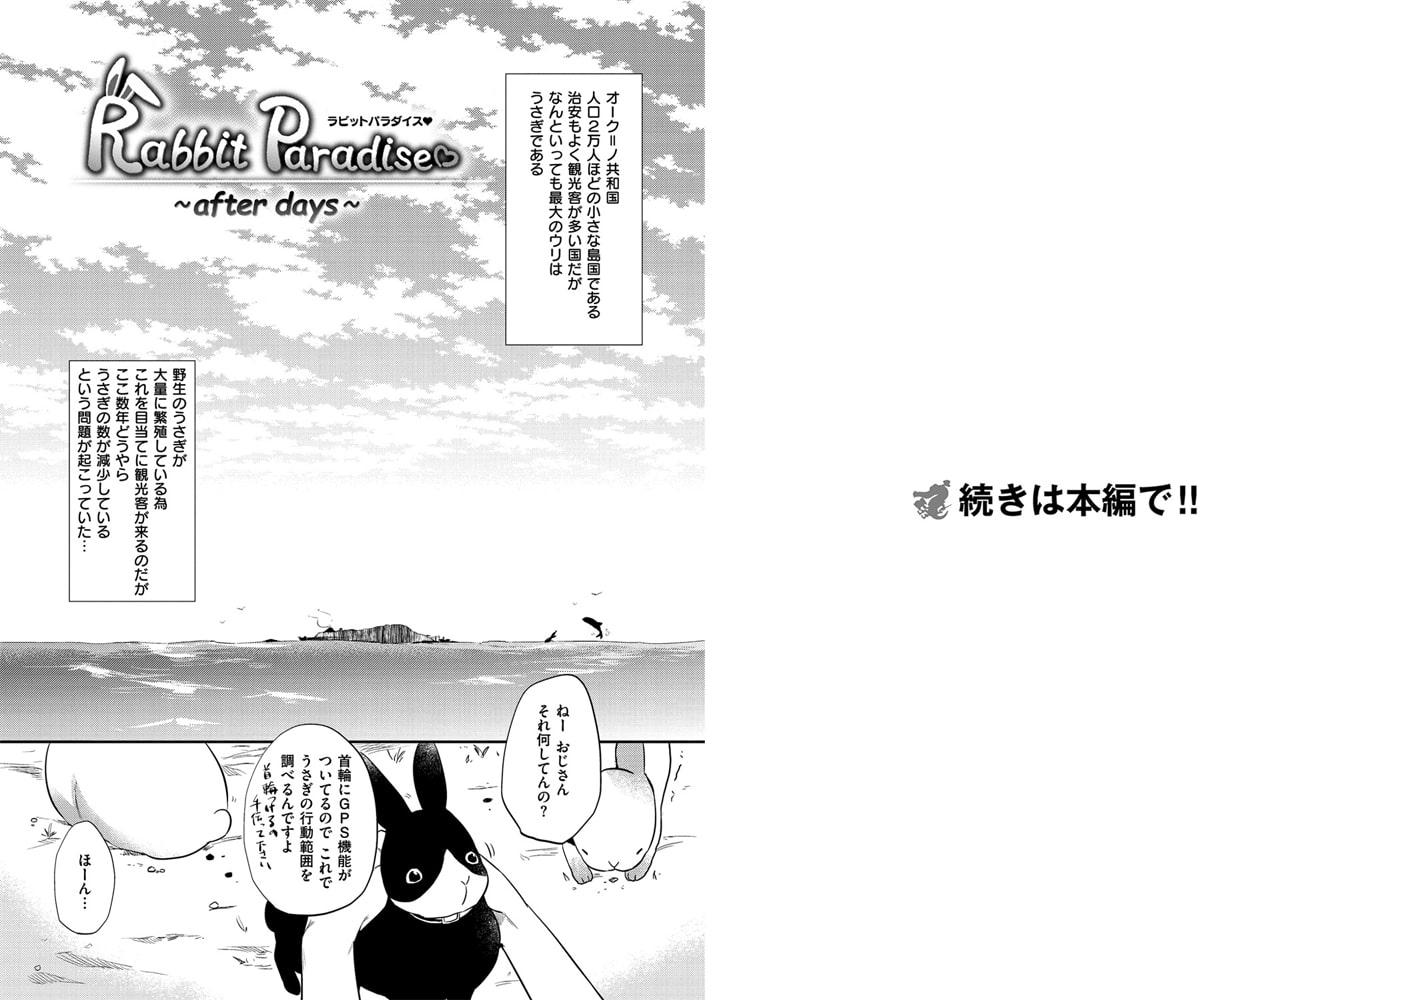 Rabbit Paradise